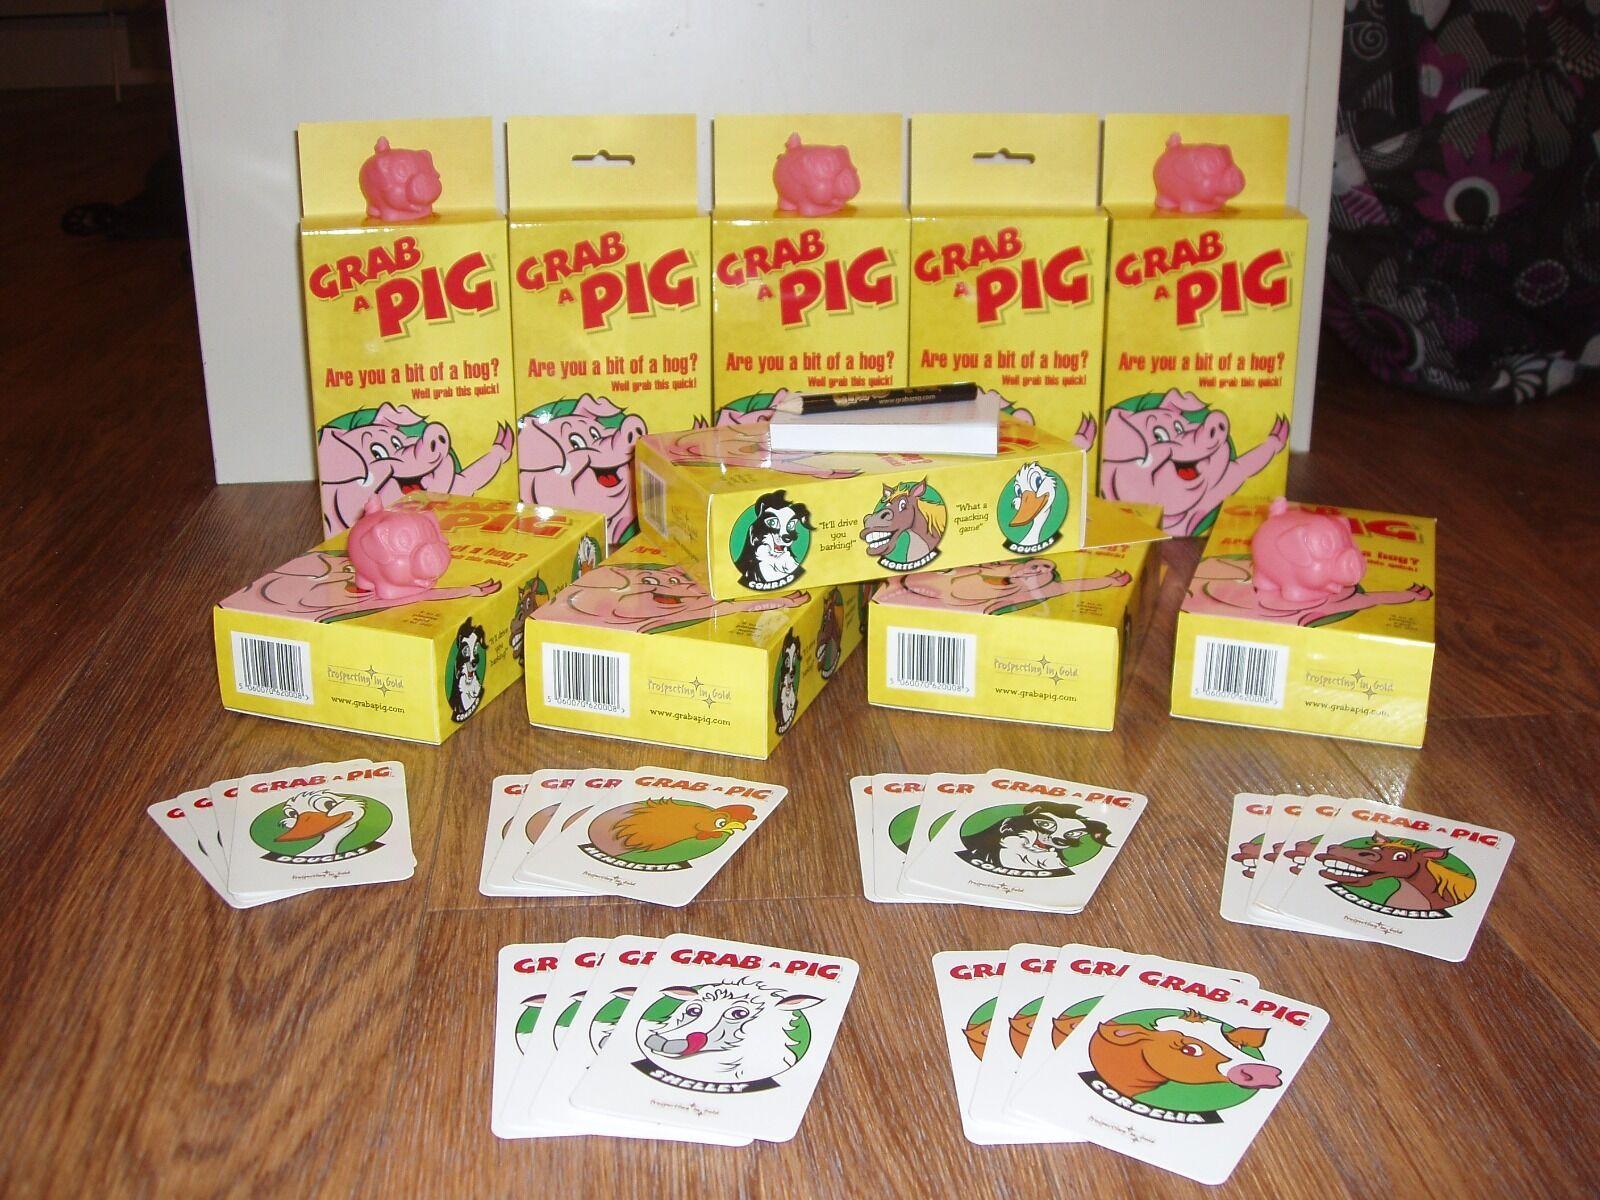 GRAB A PIG FUN CARD GAMES BUNDLE